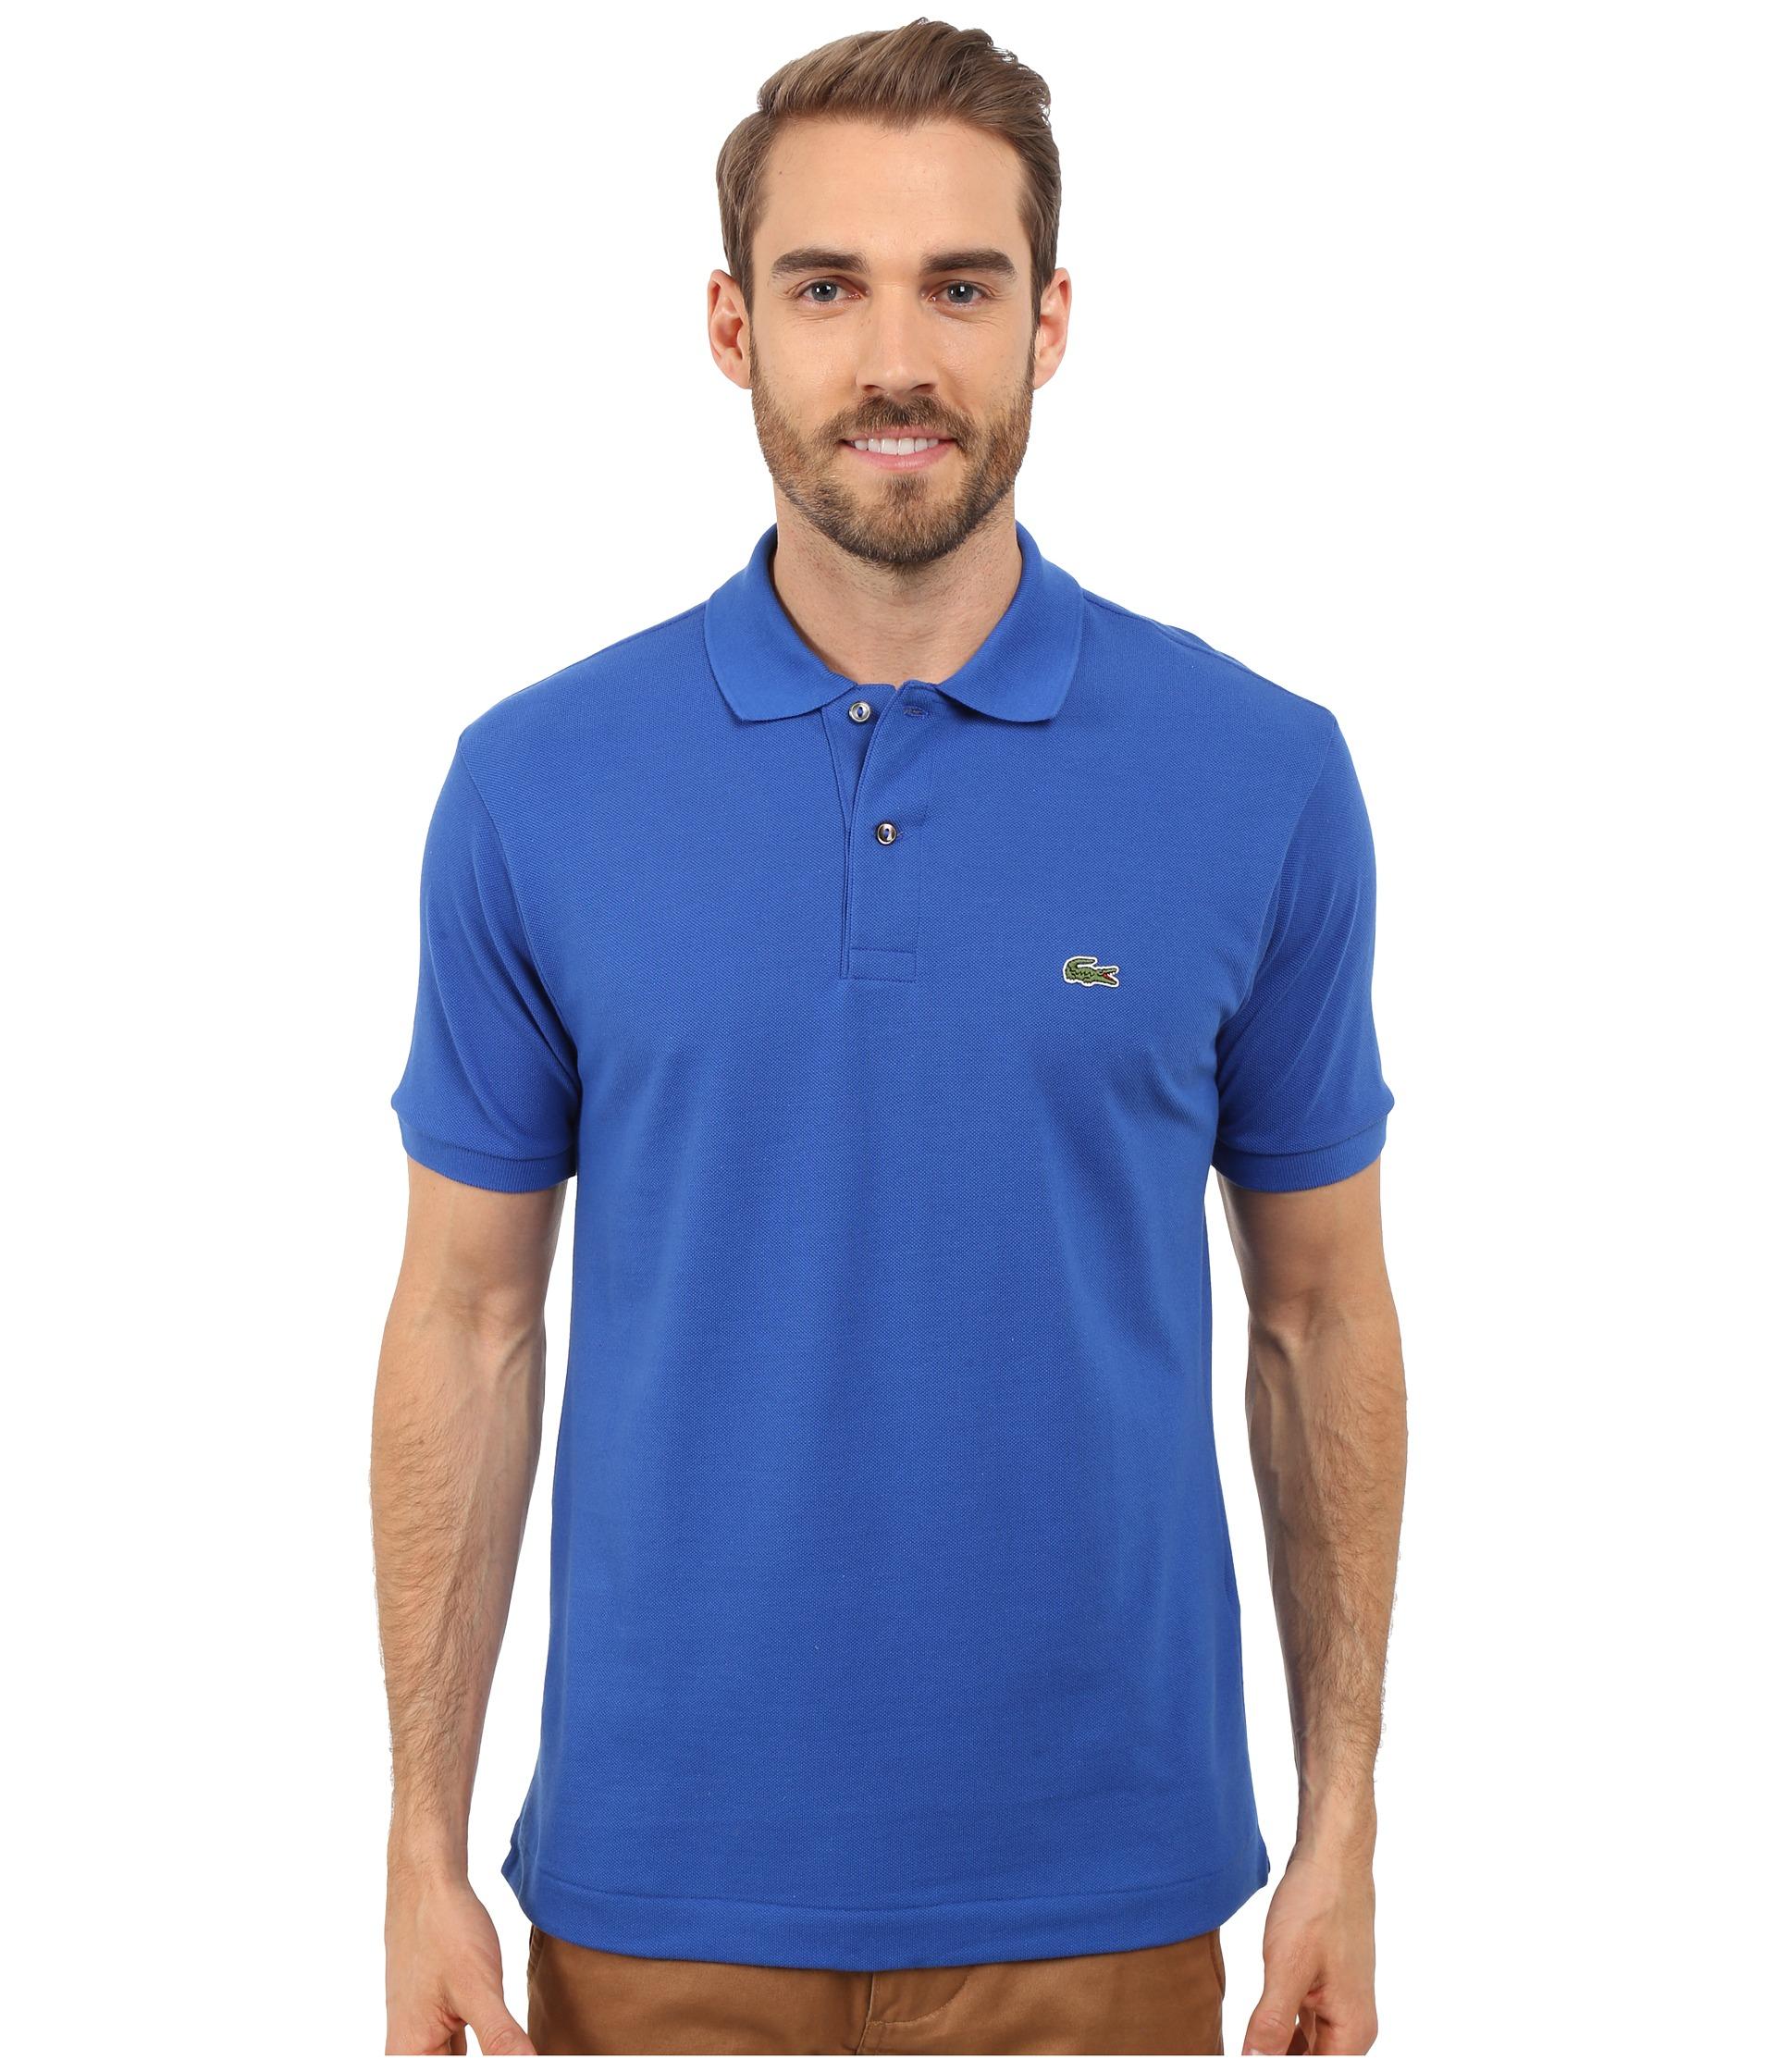 Lacoste l1212 classic pique polo shirt delta blue zappos for Lacoste size 4 polo shirt